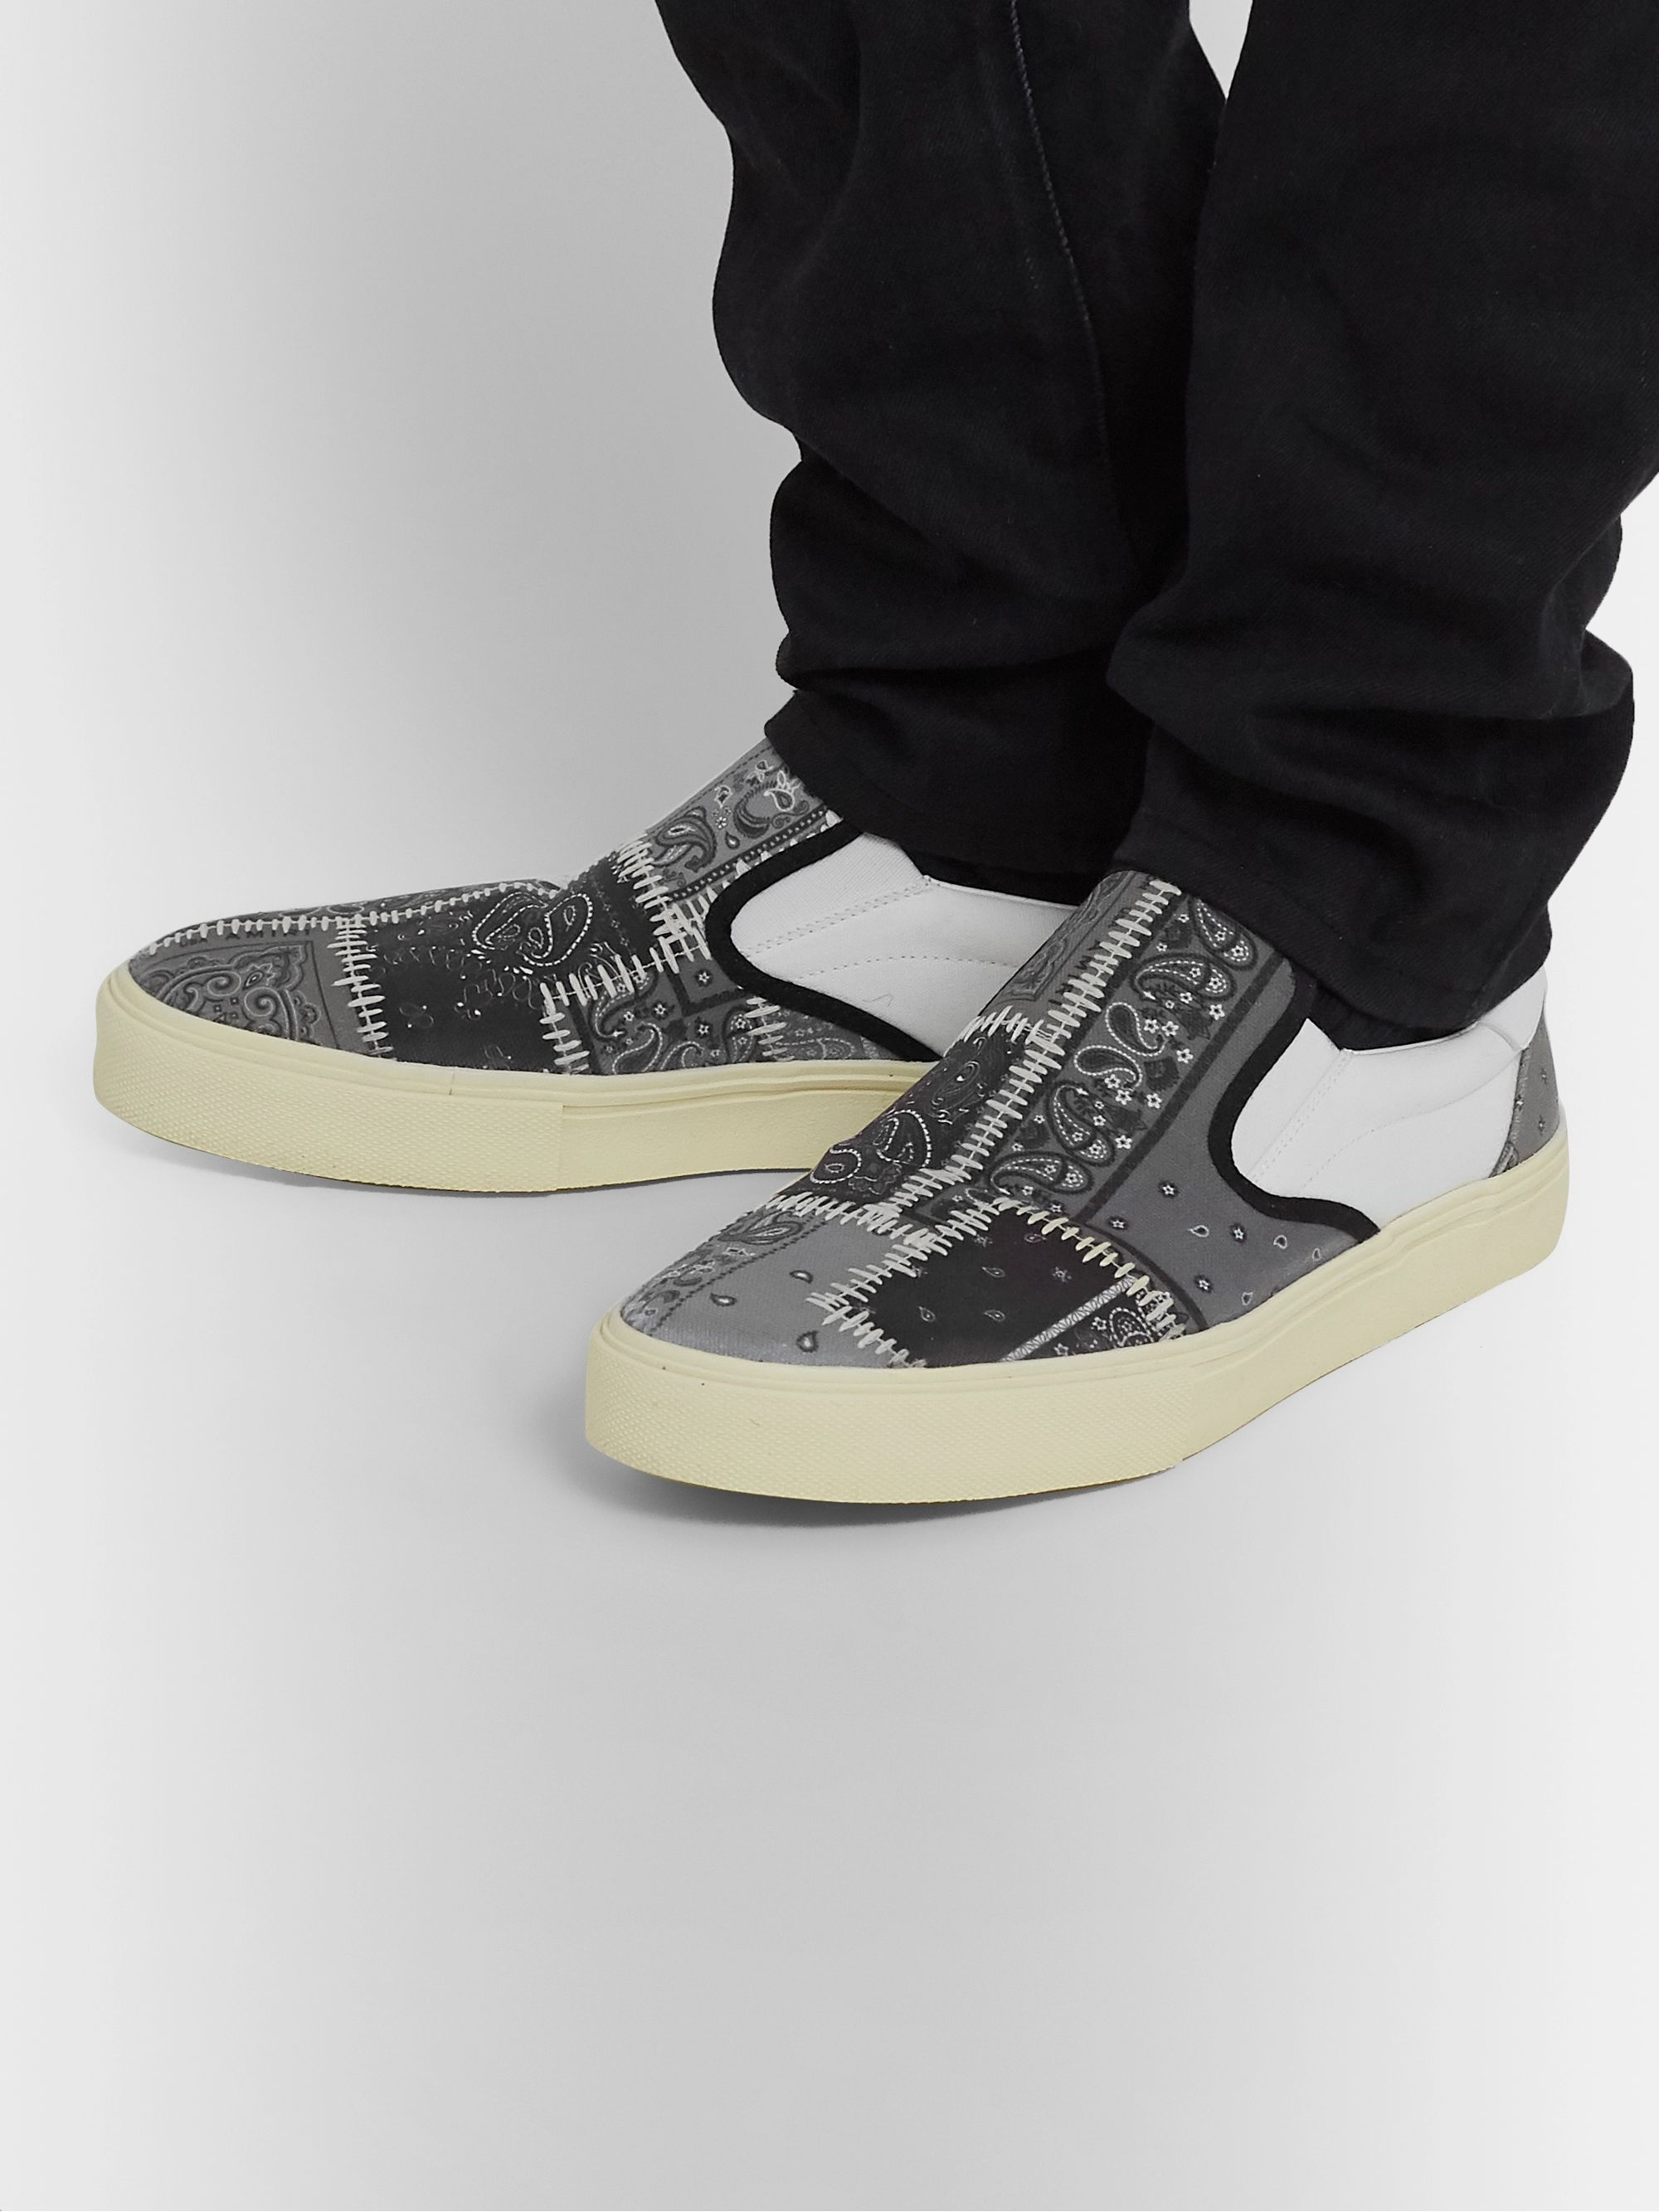 Bandana sneakers | Etsy